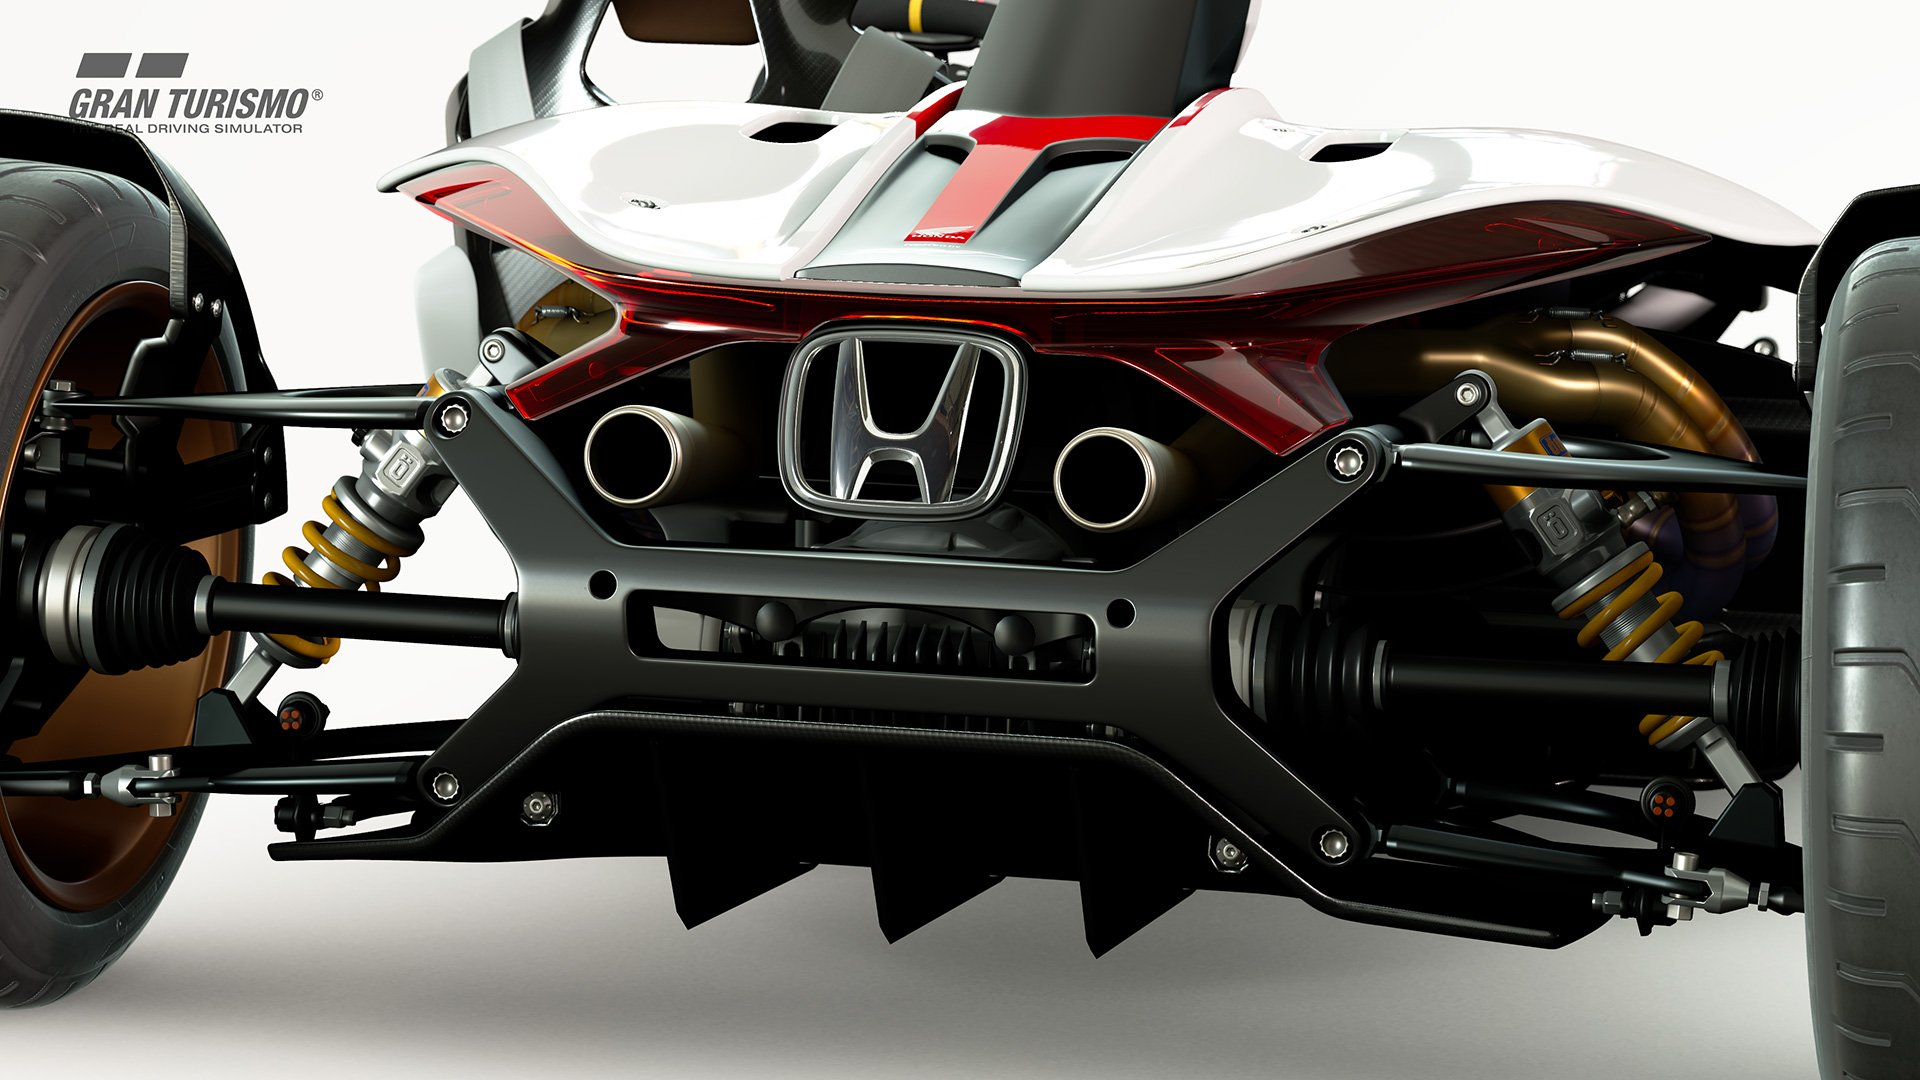 Gran Turismo Sport Honda Vision Gran Turismo back